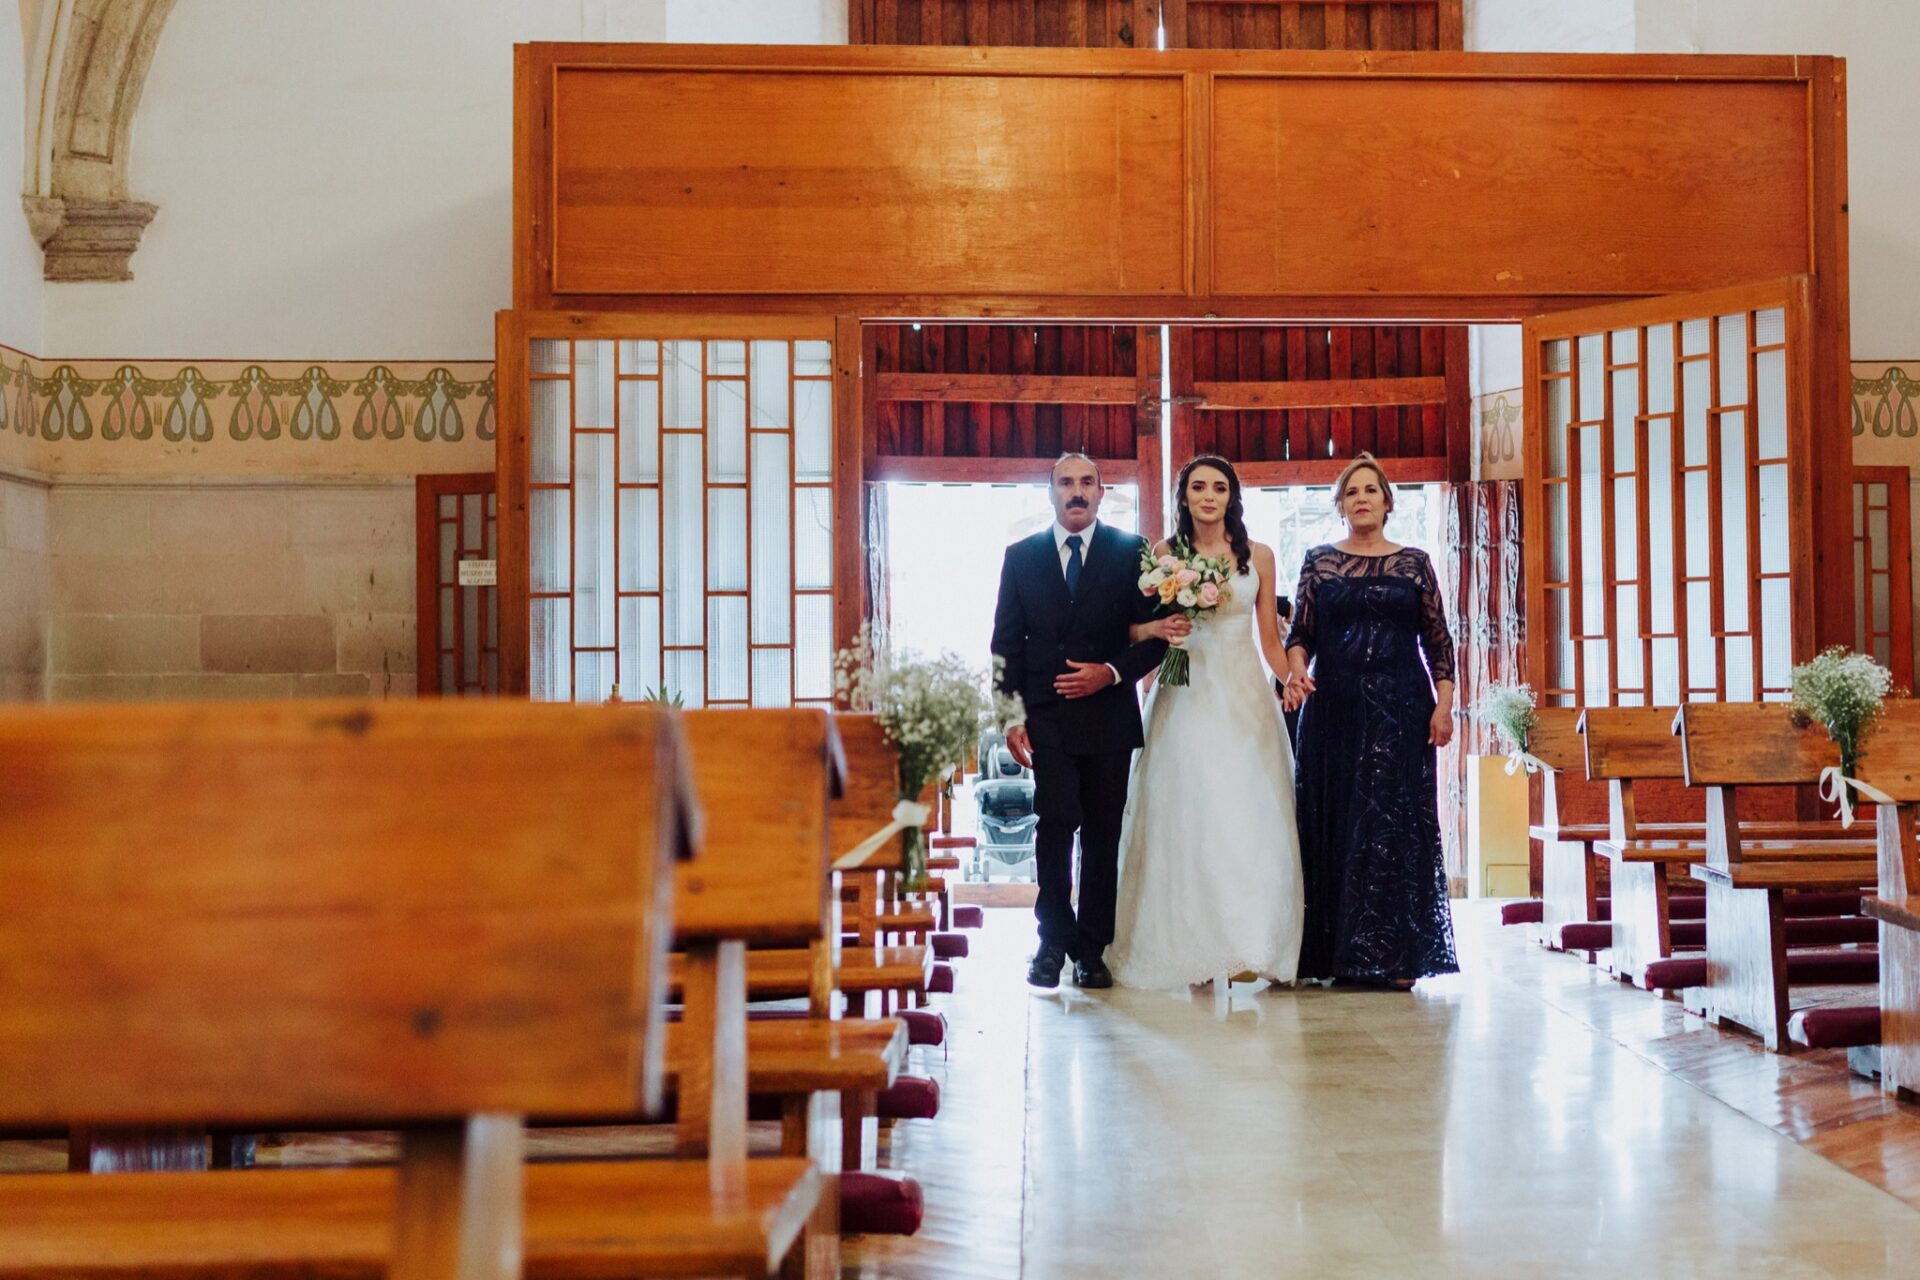 javier_noriega_fotografo_bodas_teul_zacatecas_wedding_photographer9a